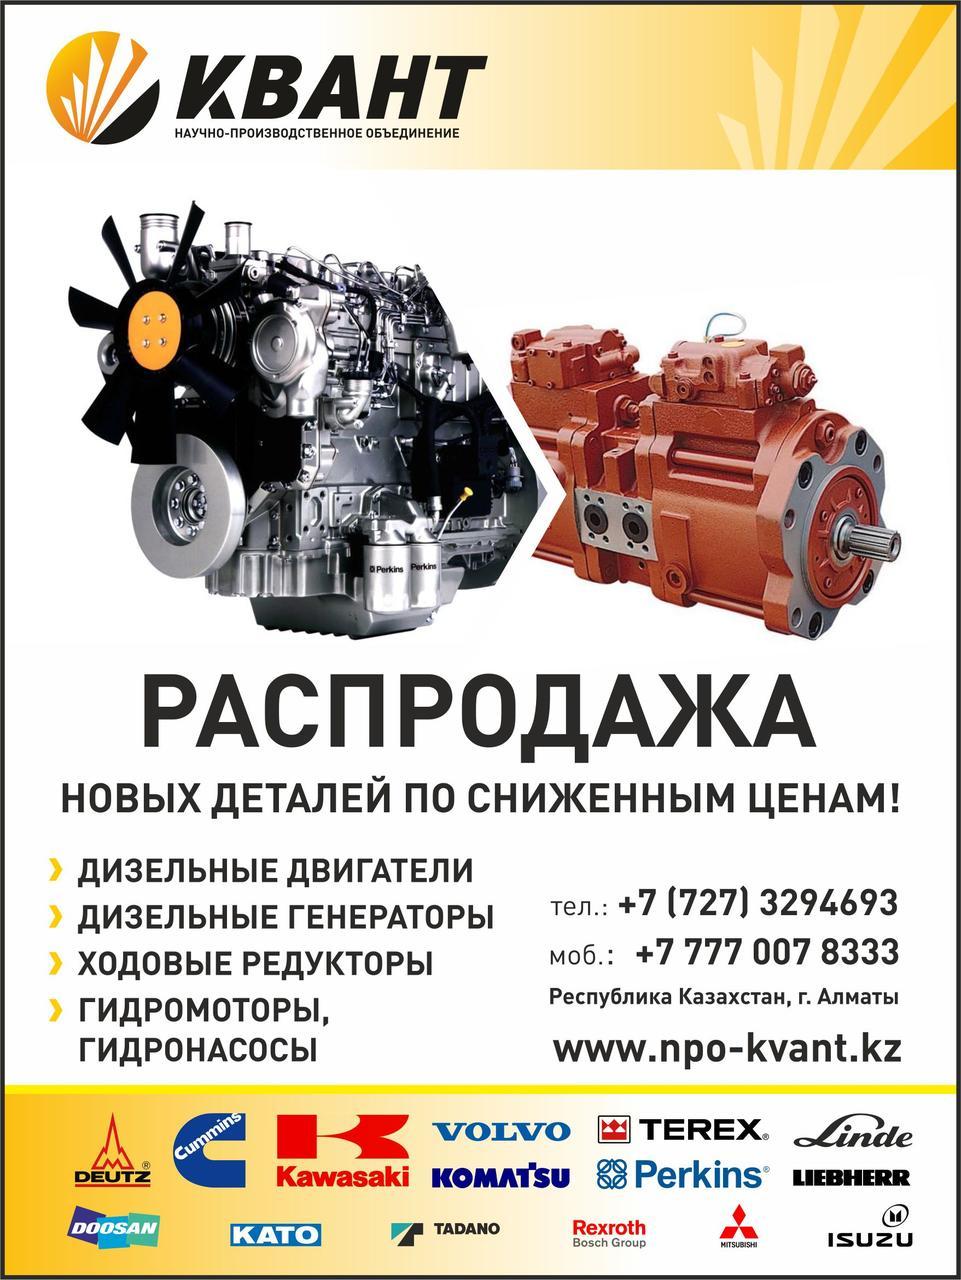 Двигатель MTU 16V 2000 G25, MTU 16V 2000 G65, MTU 16V 2000 G76F, MTU 18V 2000 G65